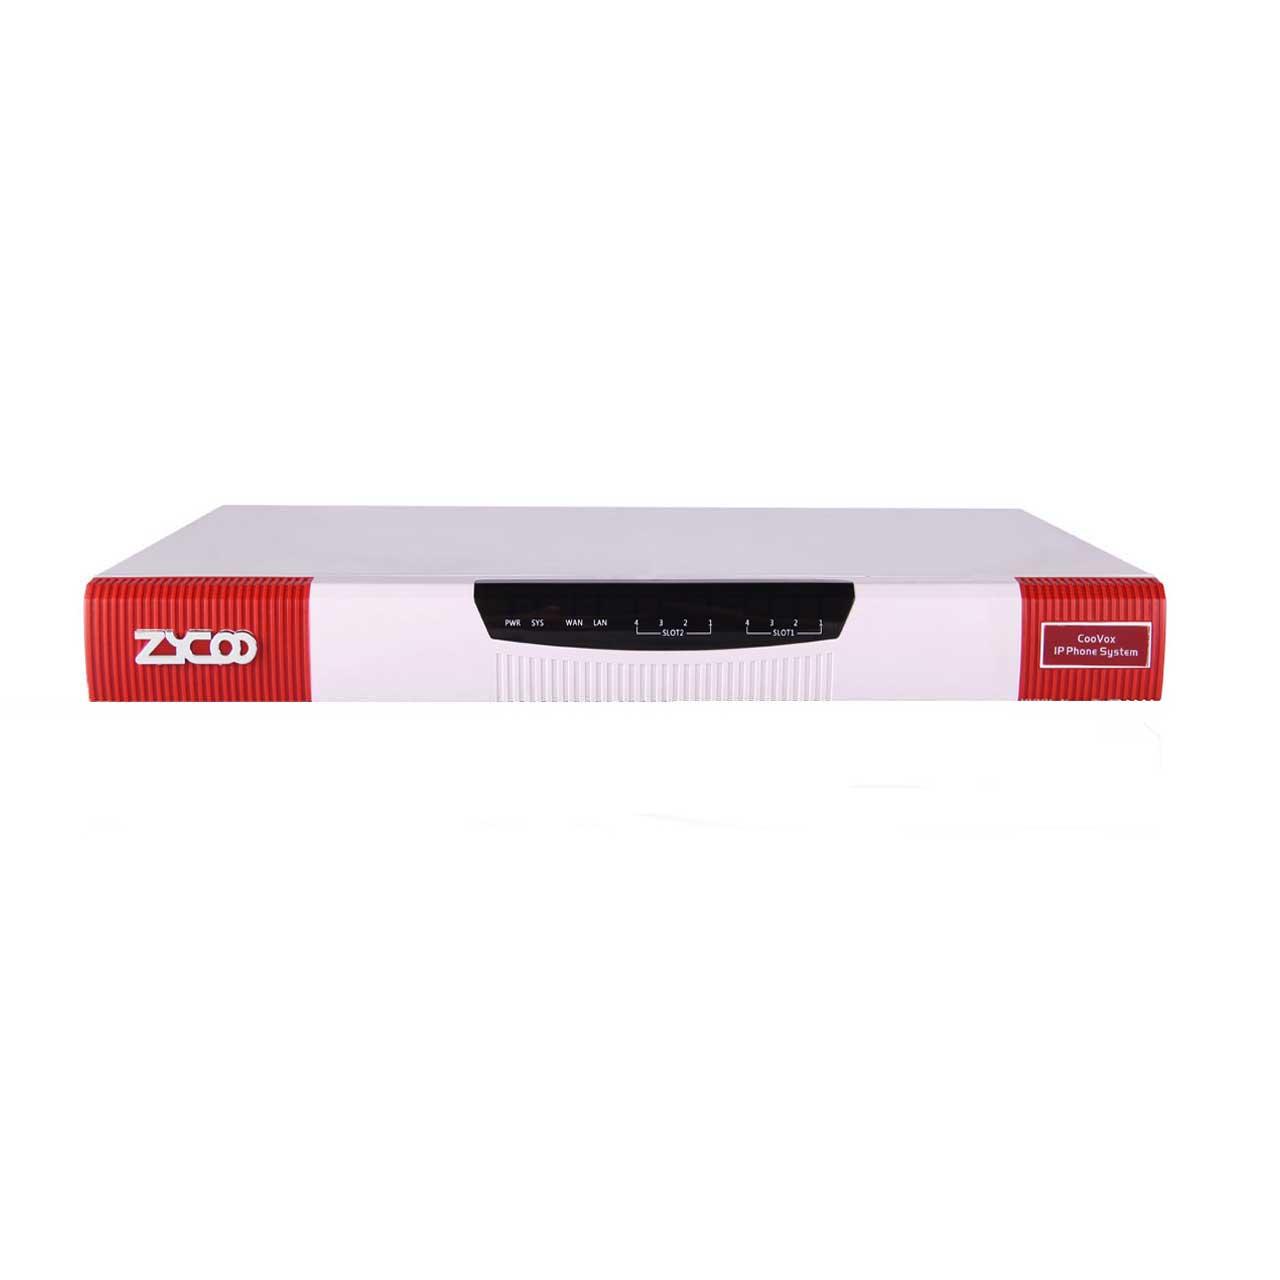 IP-PBX زایکو مدل CooVox U100V3